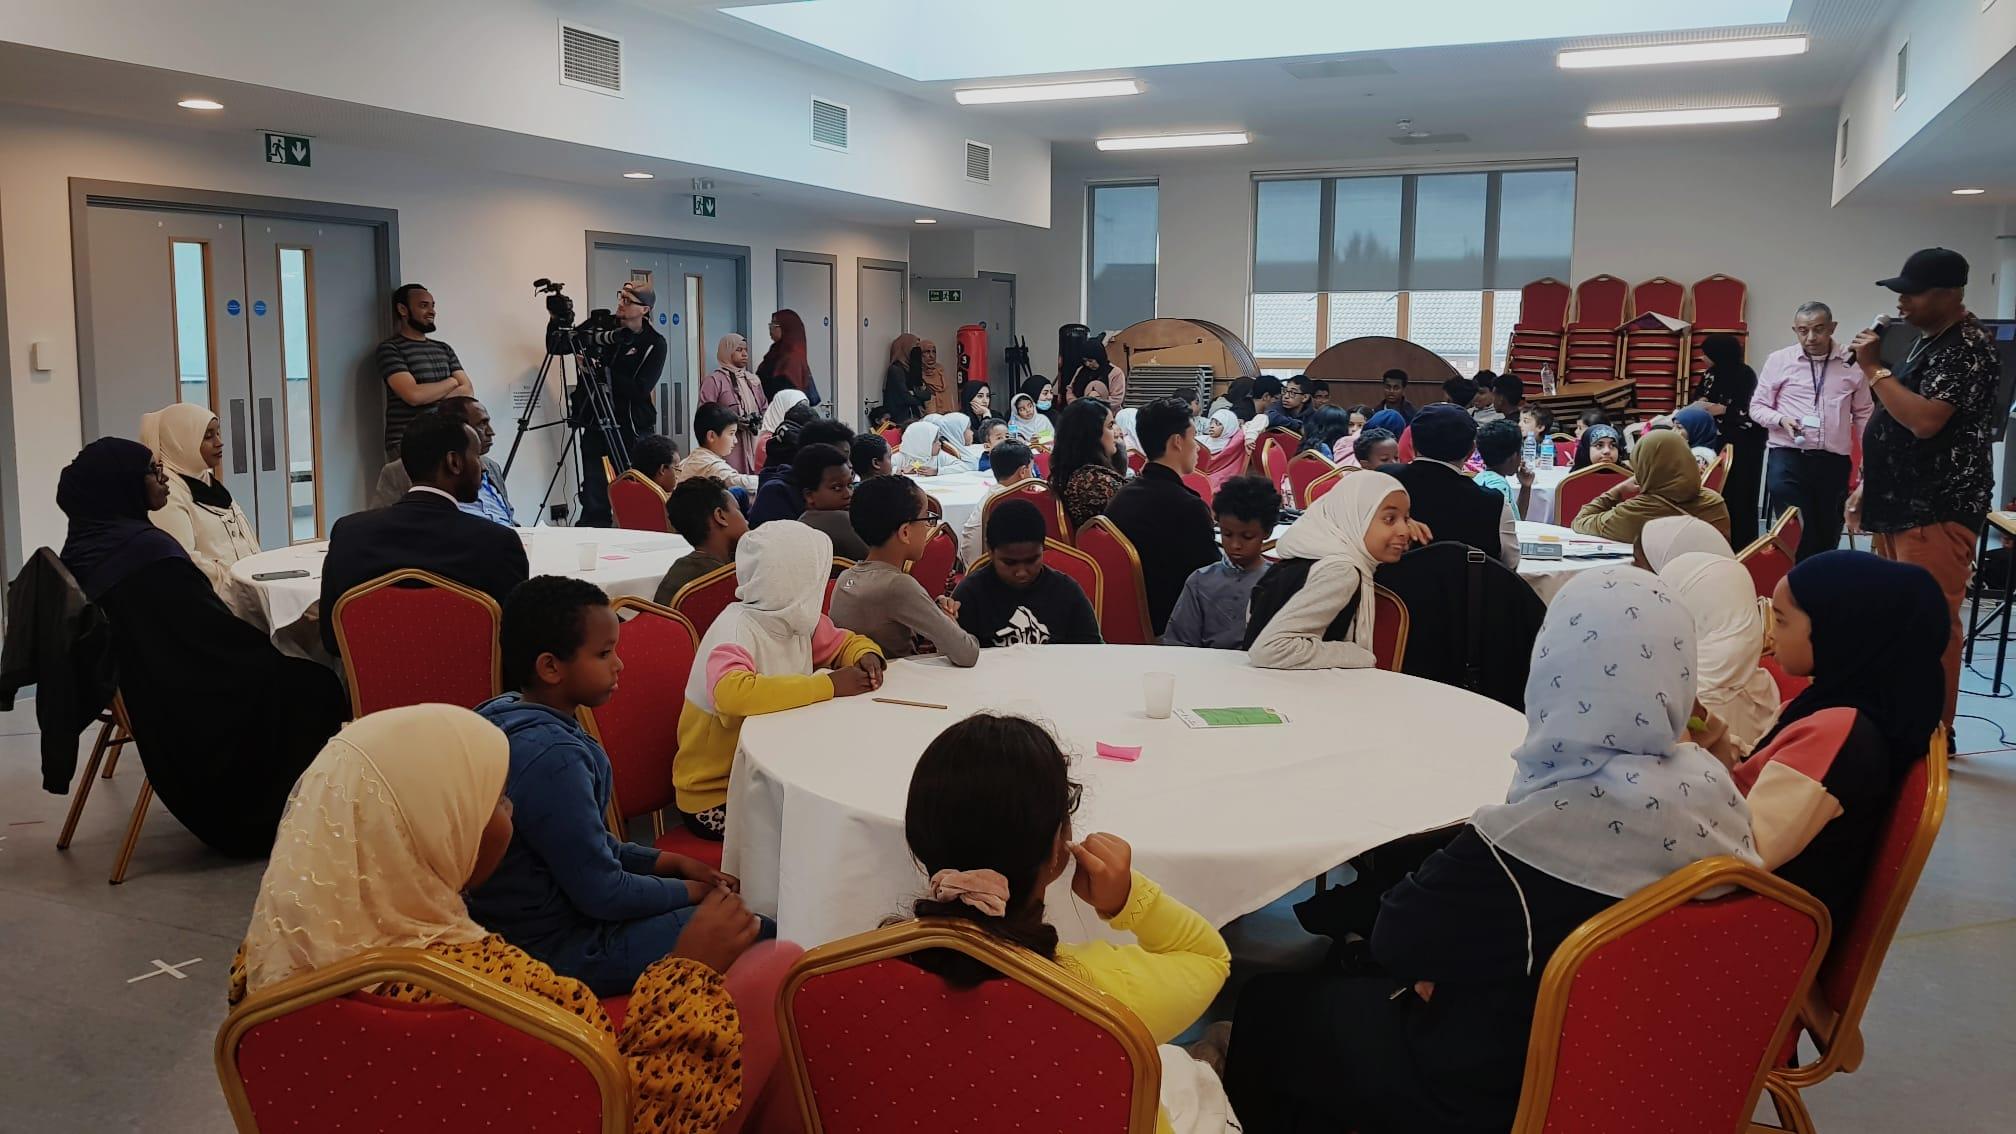 Initiatives of Change UK News